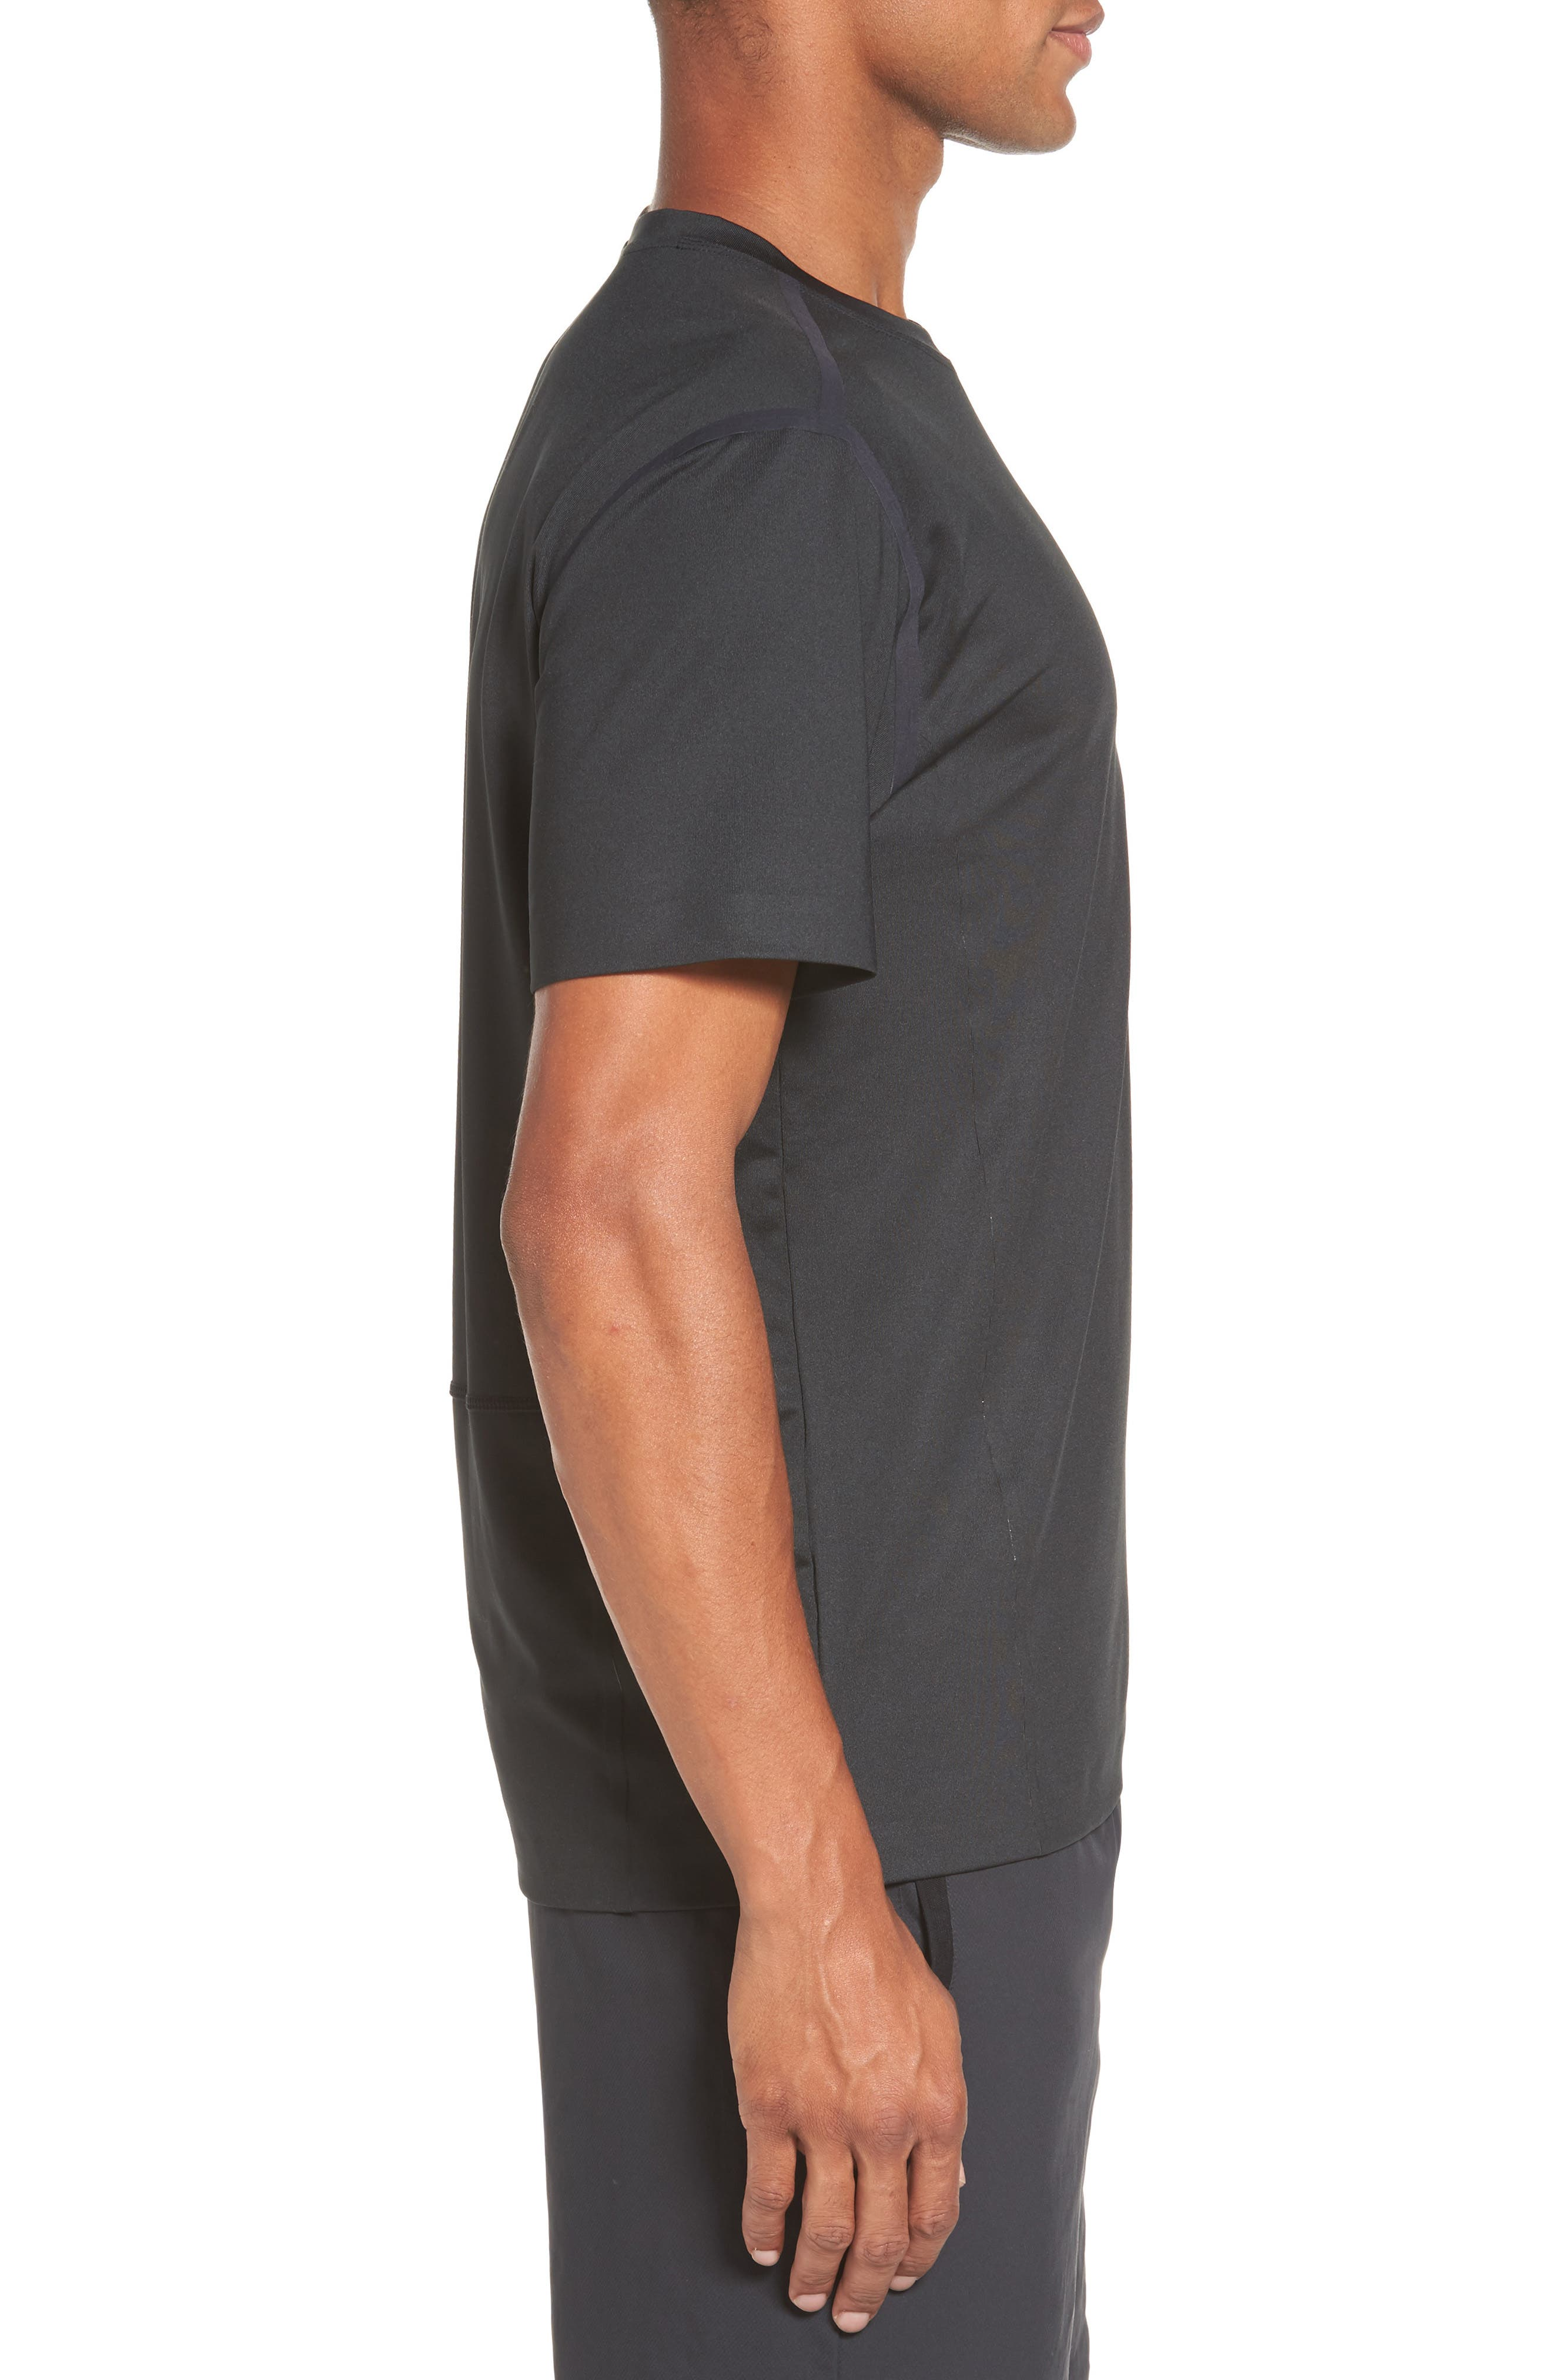 VA Compression T-Shirt,                             Alternate thumbnail 3, color,                             001